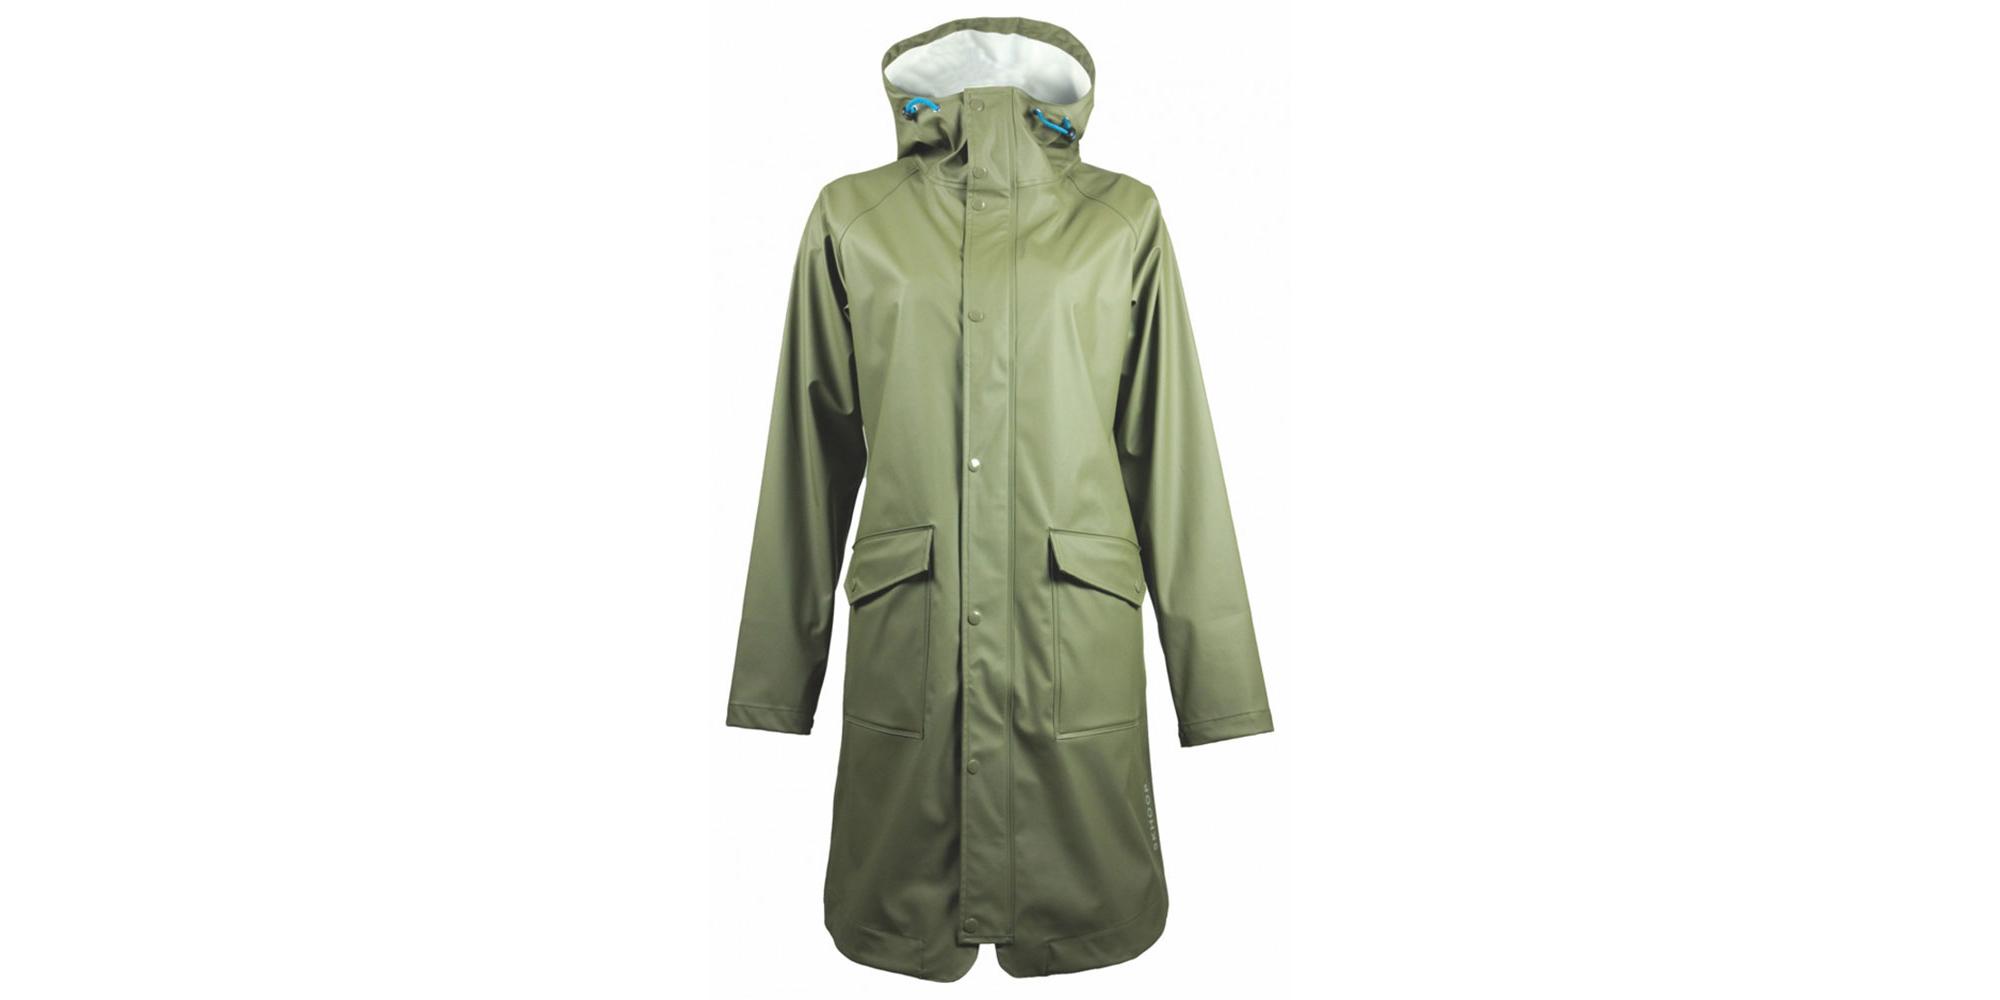 Dámský nepromokavý kabát Ginger Rain Coat Skhoop